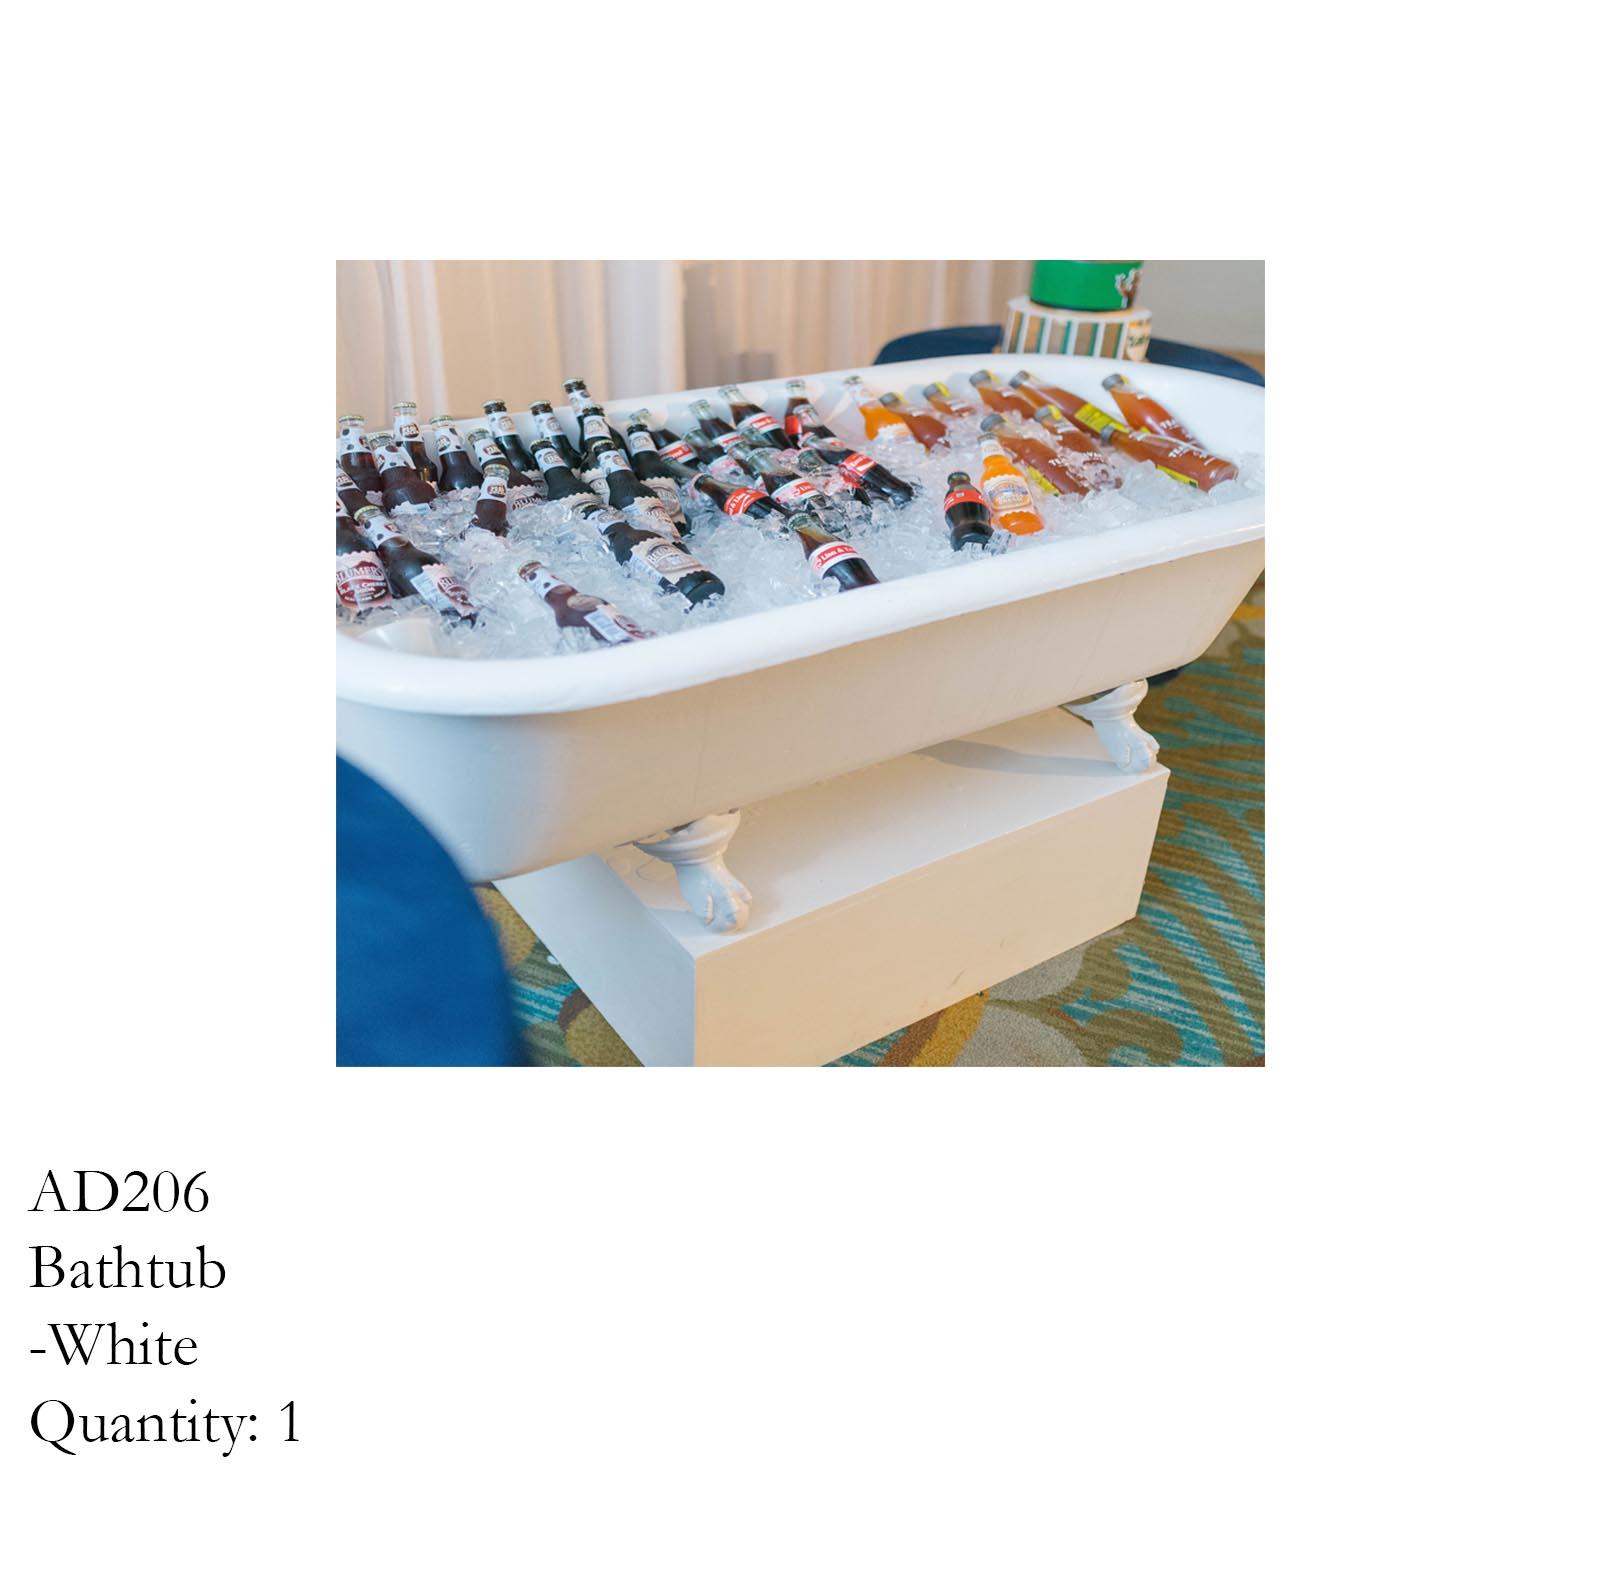 AD206.jpg